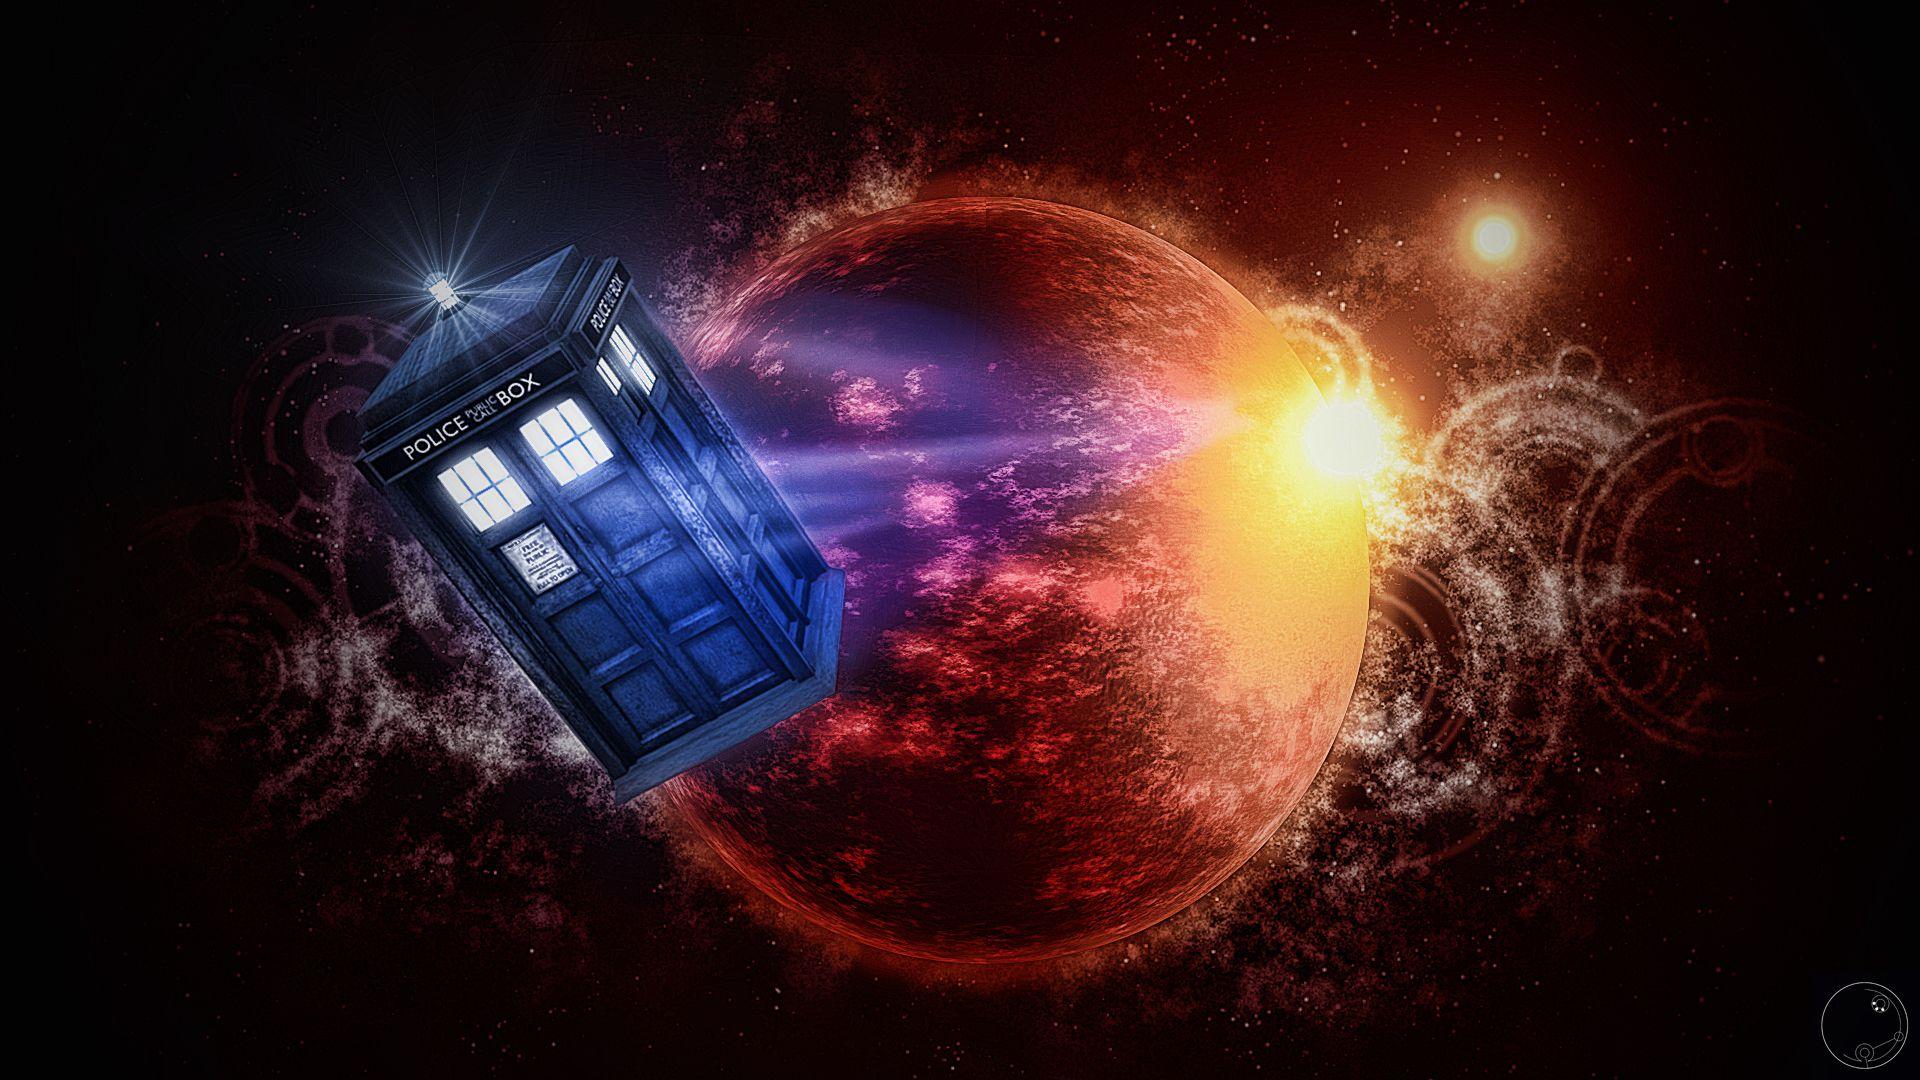 Tardis Leaving 2 By Guile93 On Deviantart Wallpaper Space Tardis Doctor Who Art